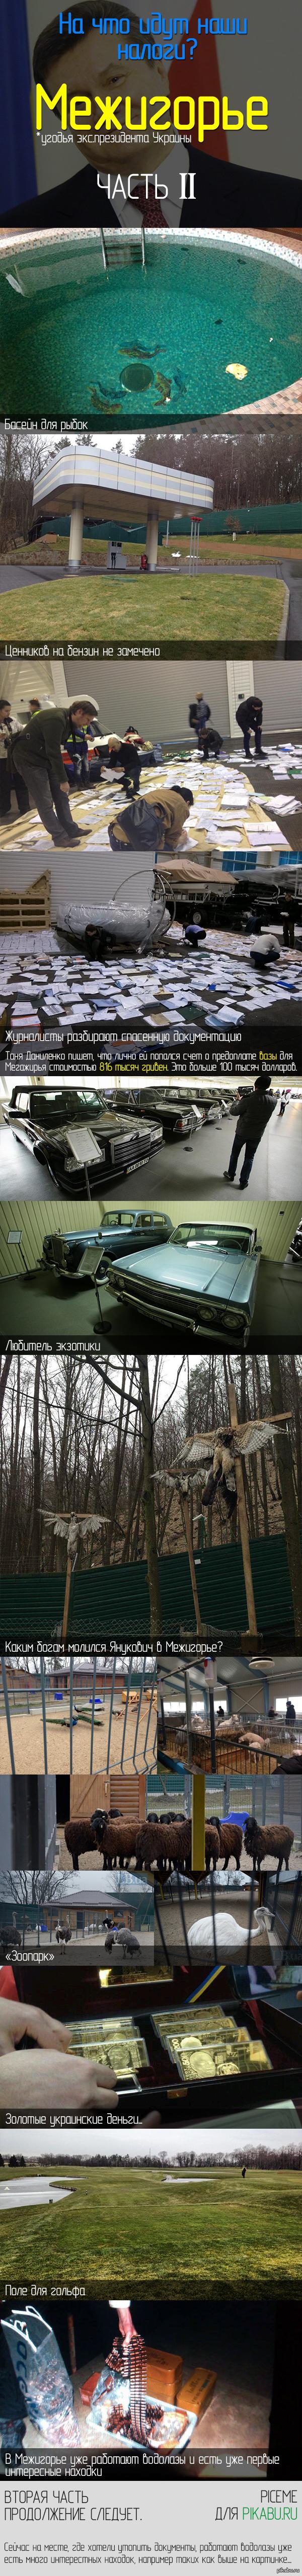 Межигорье - Музей коррупции